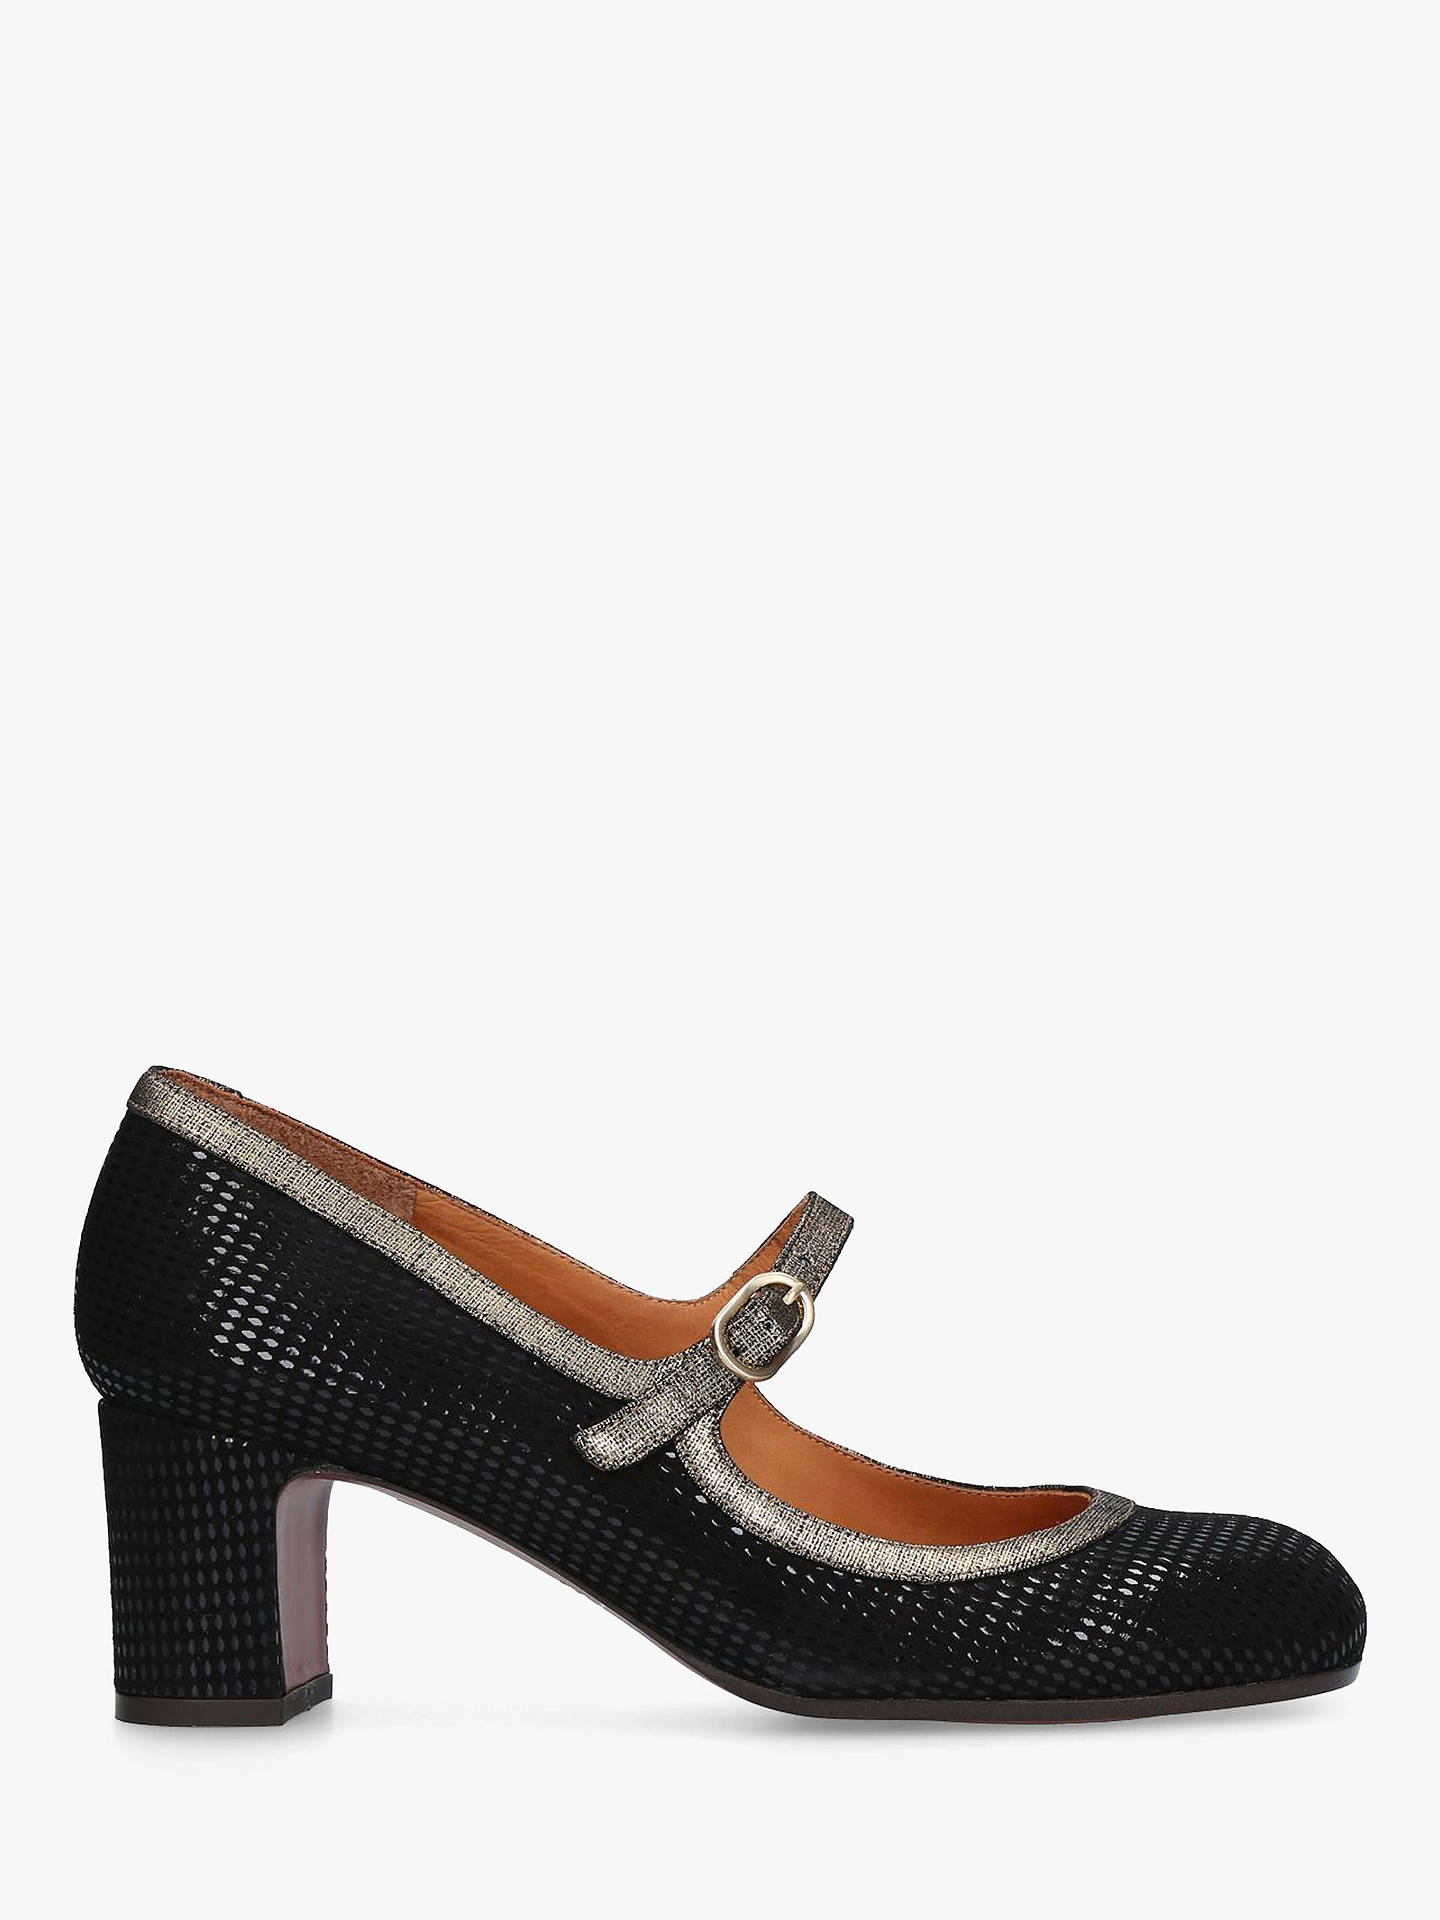 cbf161394db6 Buy Chie Mihara Happo Mid Heel Court Shoes